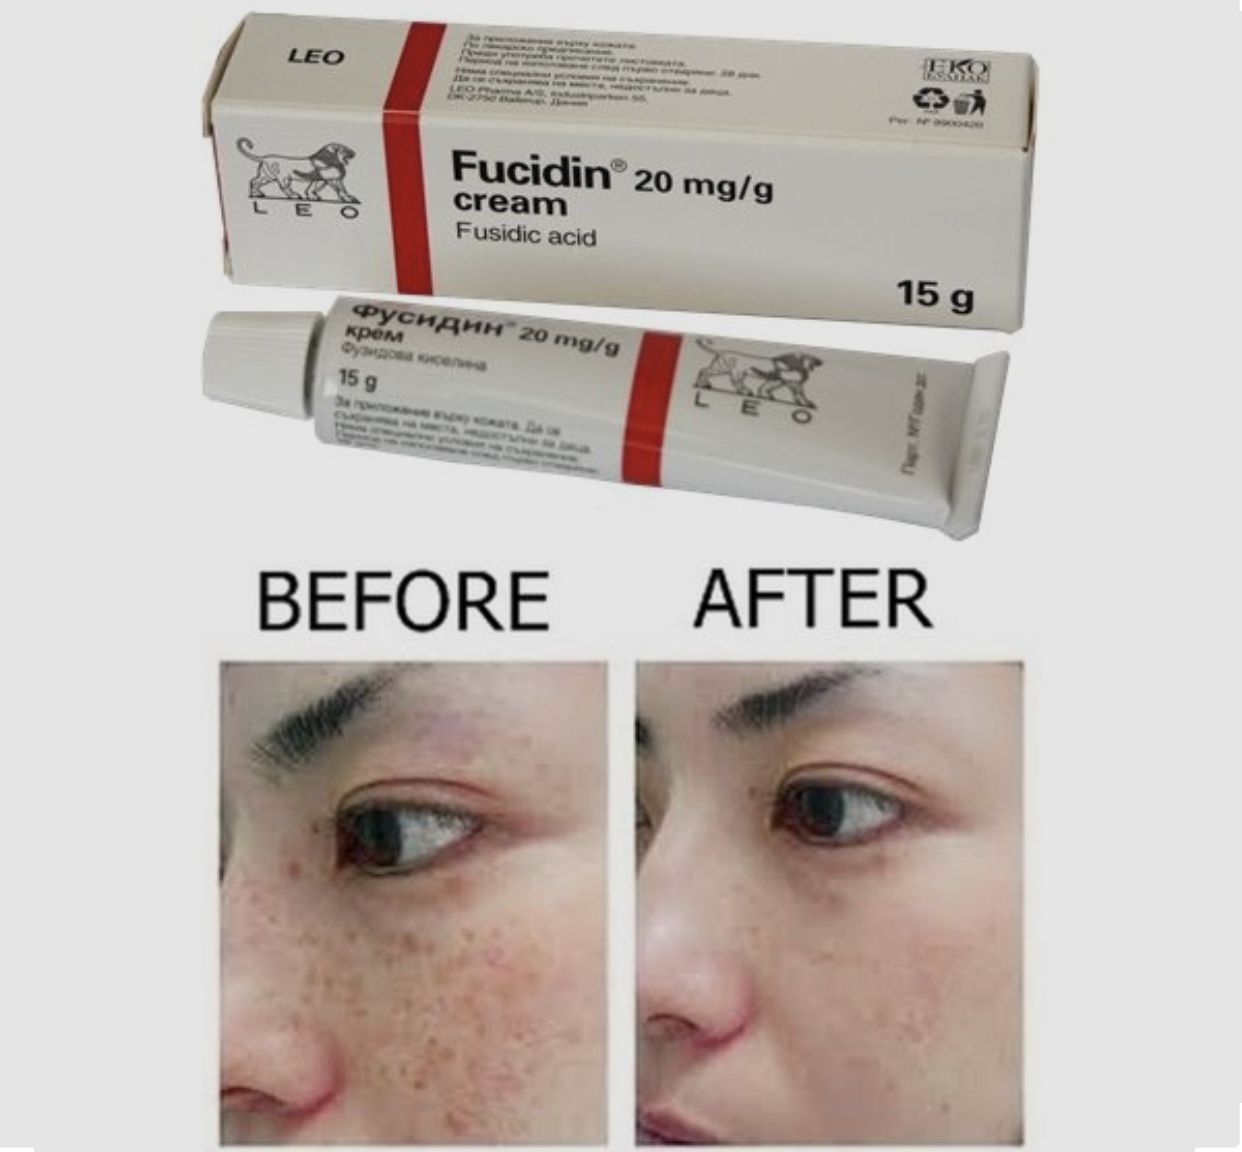 AliExpress - Fucidin 20 mg/g Face Cream acne, blackheads, herpes on the lips treatment cream, beautifying face Original Fast shipping